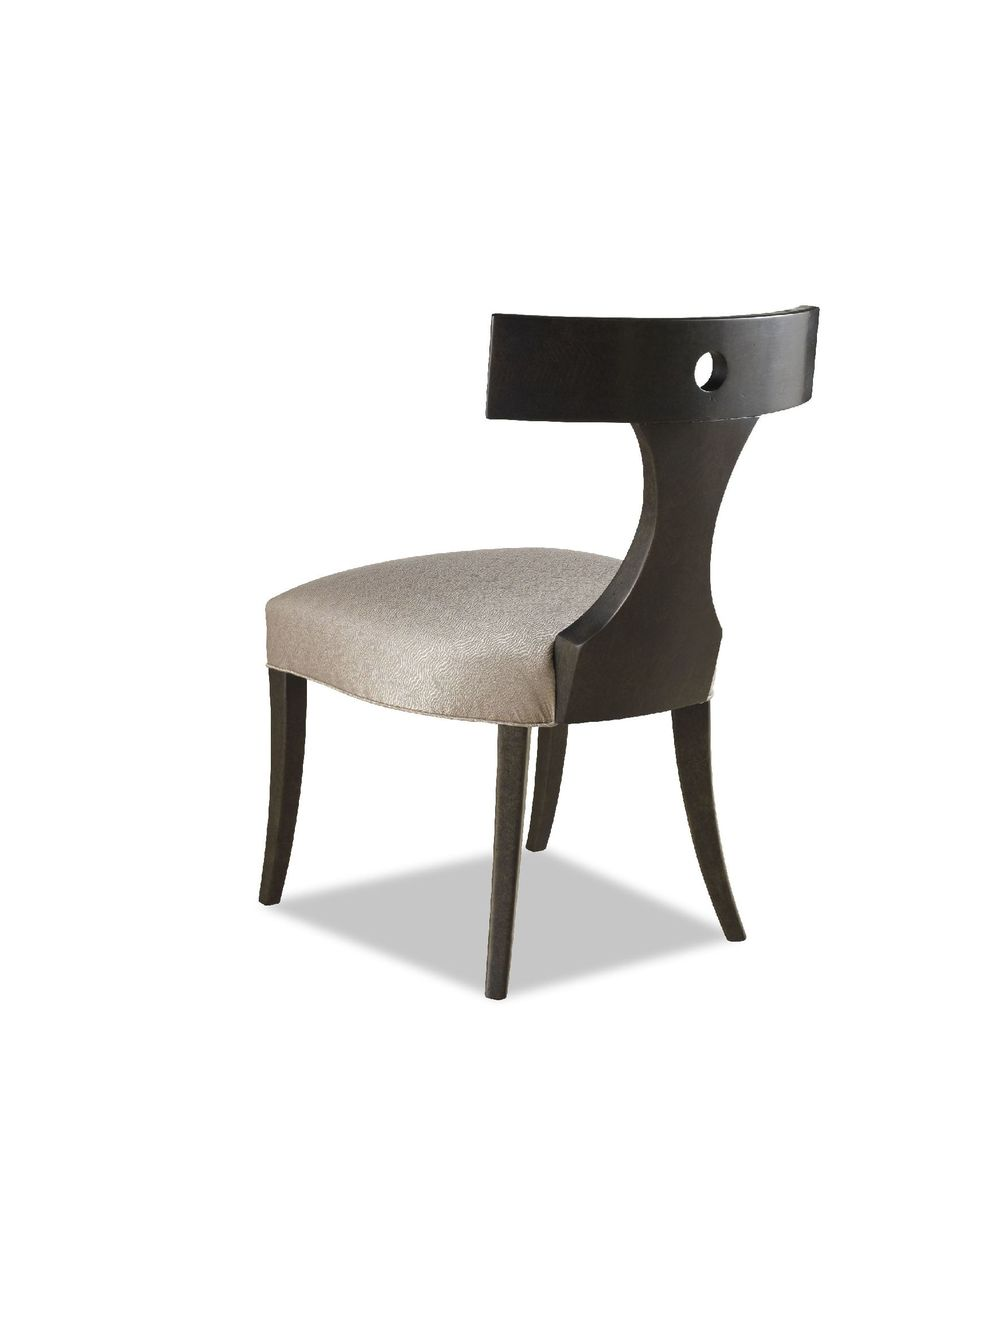 Chaddock - Luxor Side Chair